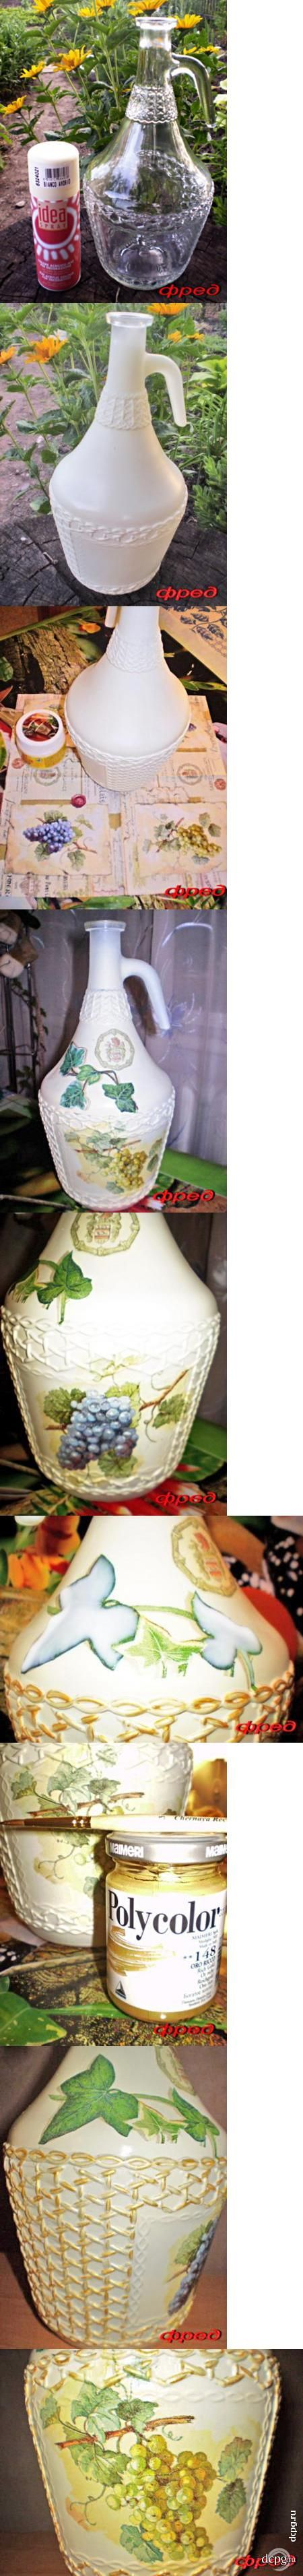 Декупаж - Сайт любителей декупажа - DCPG.RU | Бутыль для вина